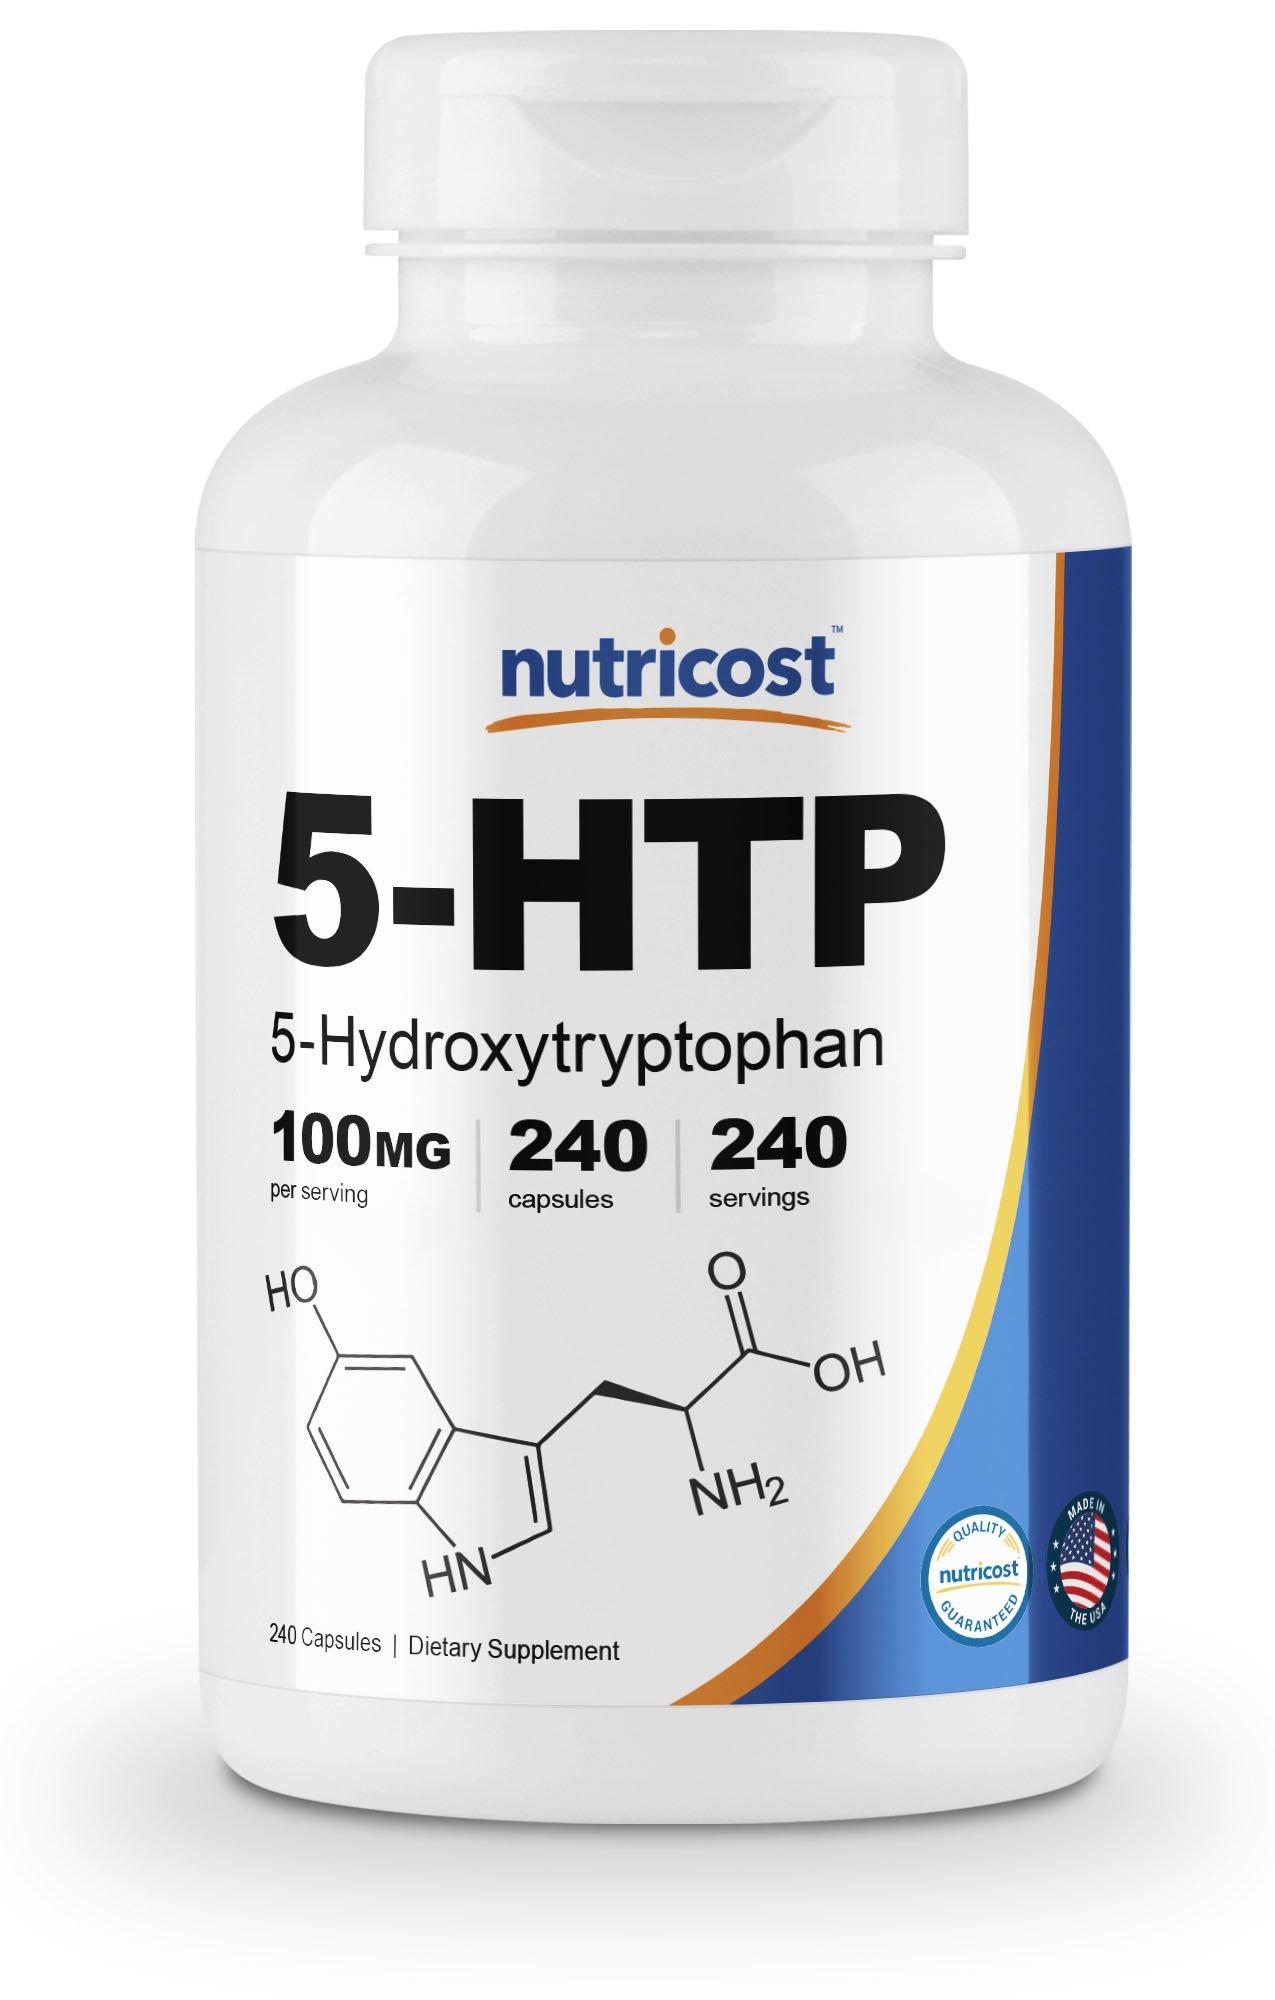 Nutricost 5-HTP 100mg, 240 Capsules (5-Hydroxytryptophan) - Veggie Caps